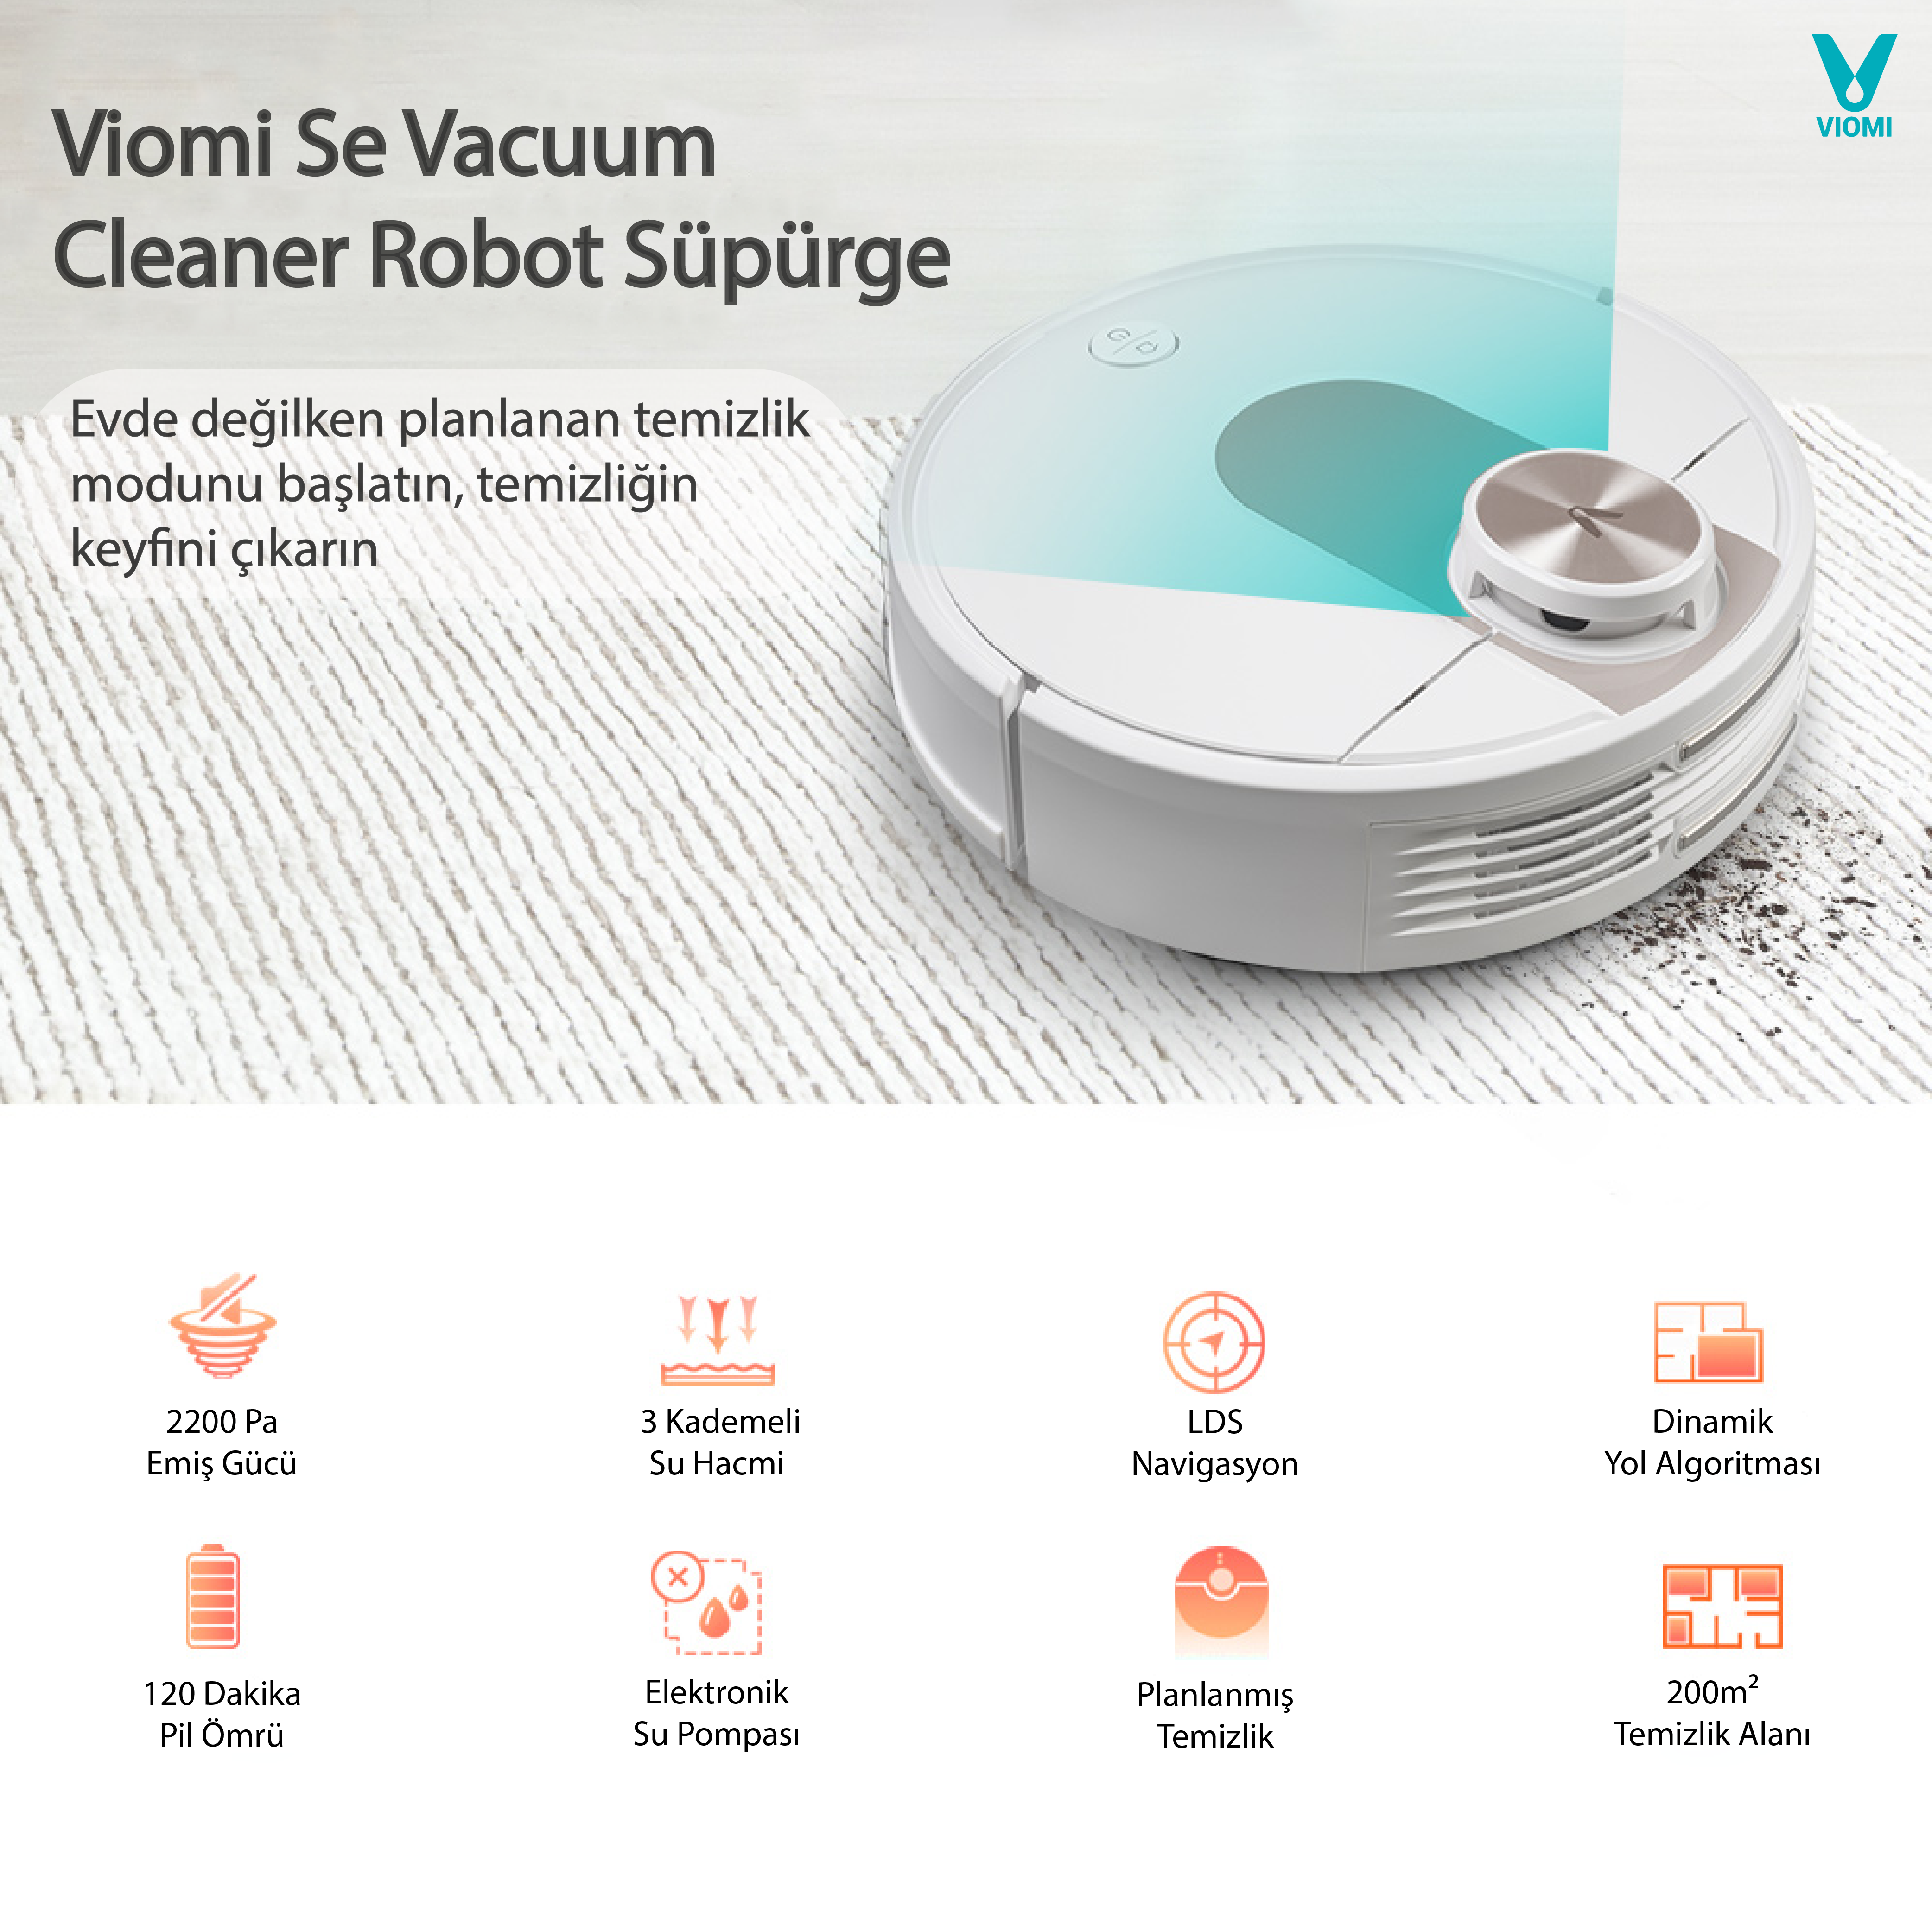 Viomi Se Vacuum Cleaner Lazer Sensör Robot Süpürge ve Paspas